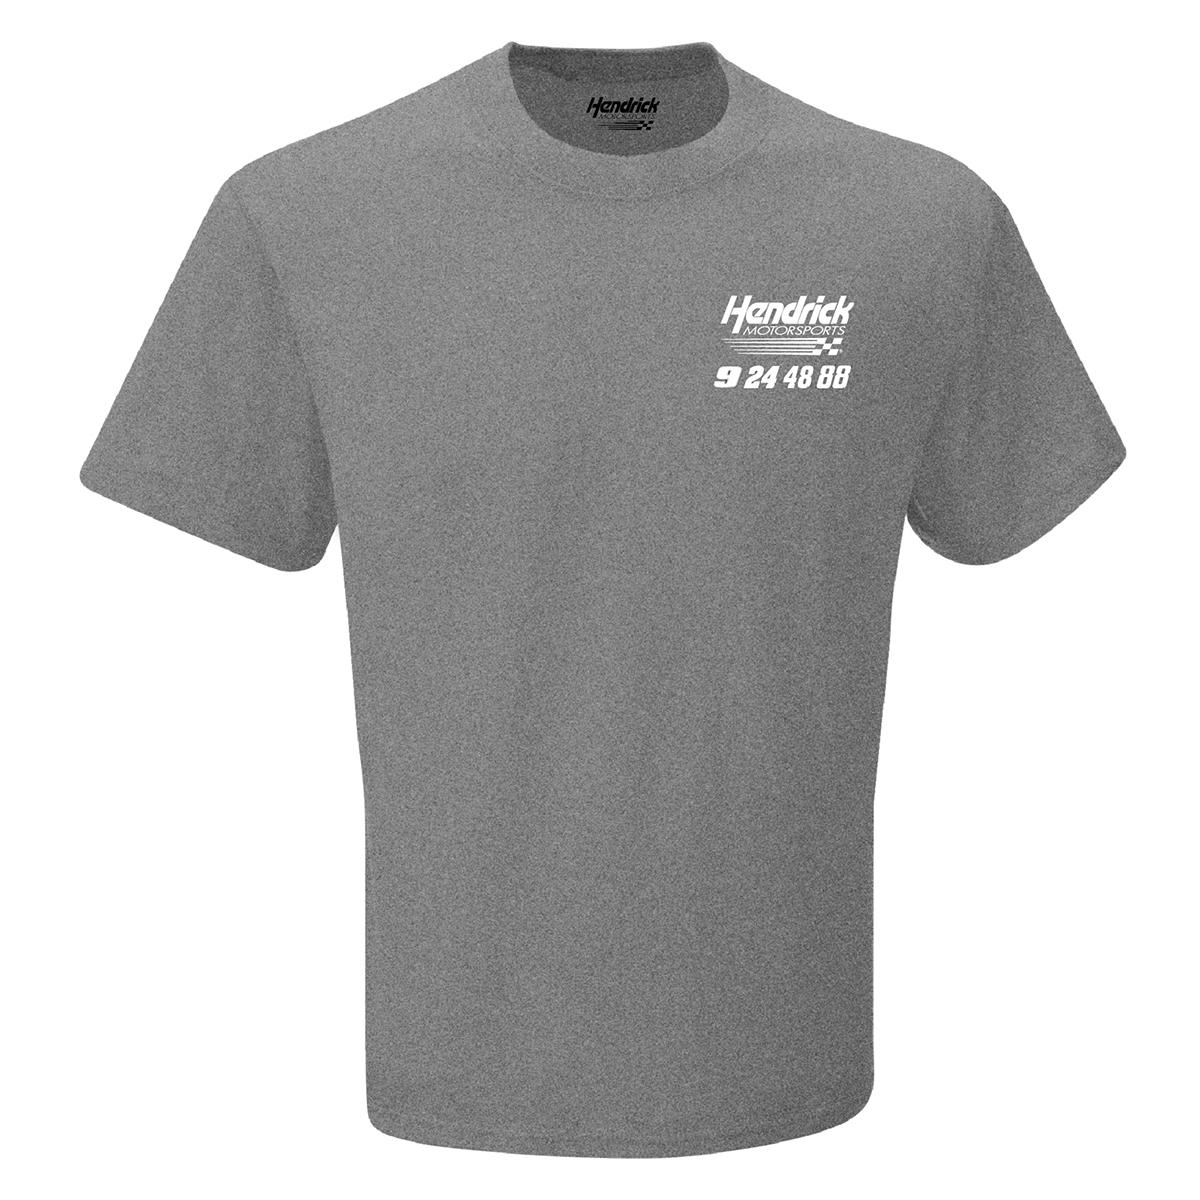 2019 NASCAR Hendrick Motorsports 4 Number Gray T-shirt